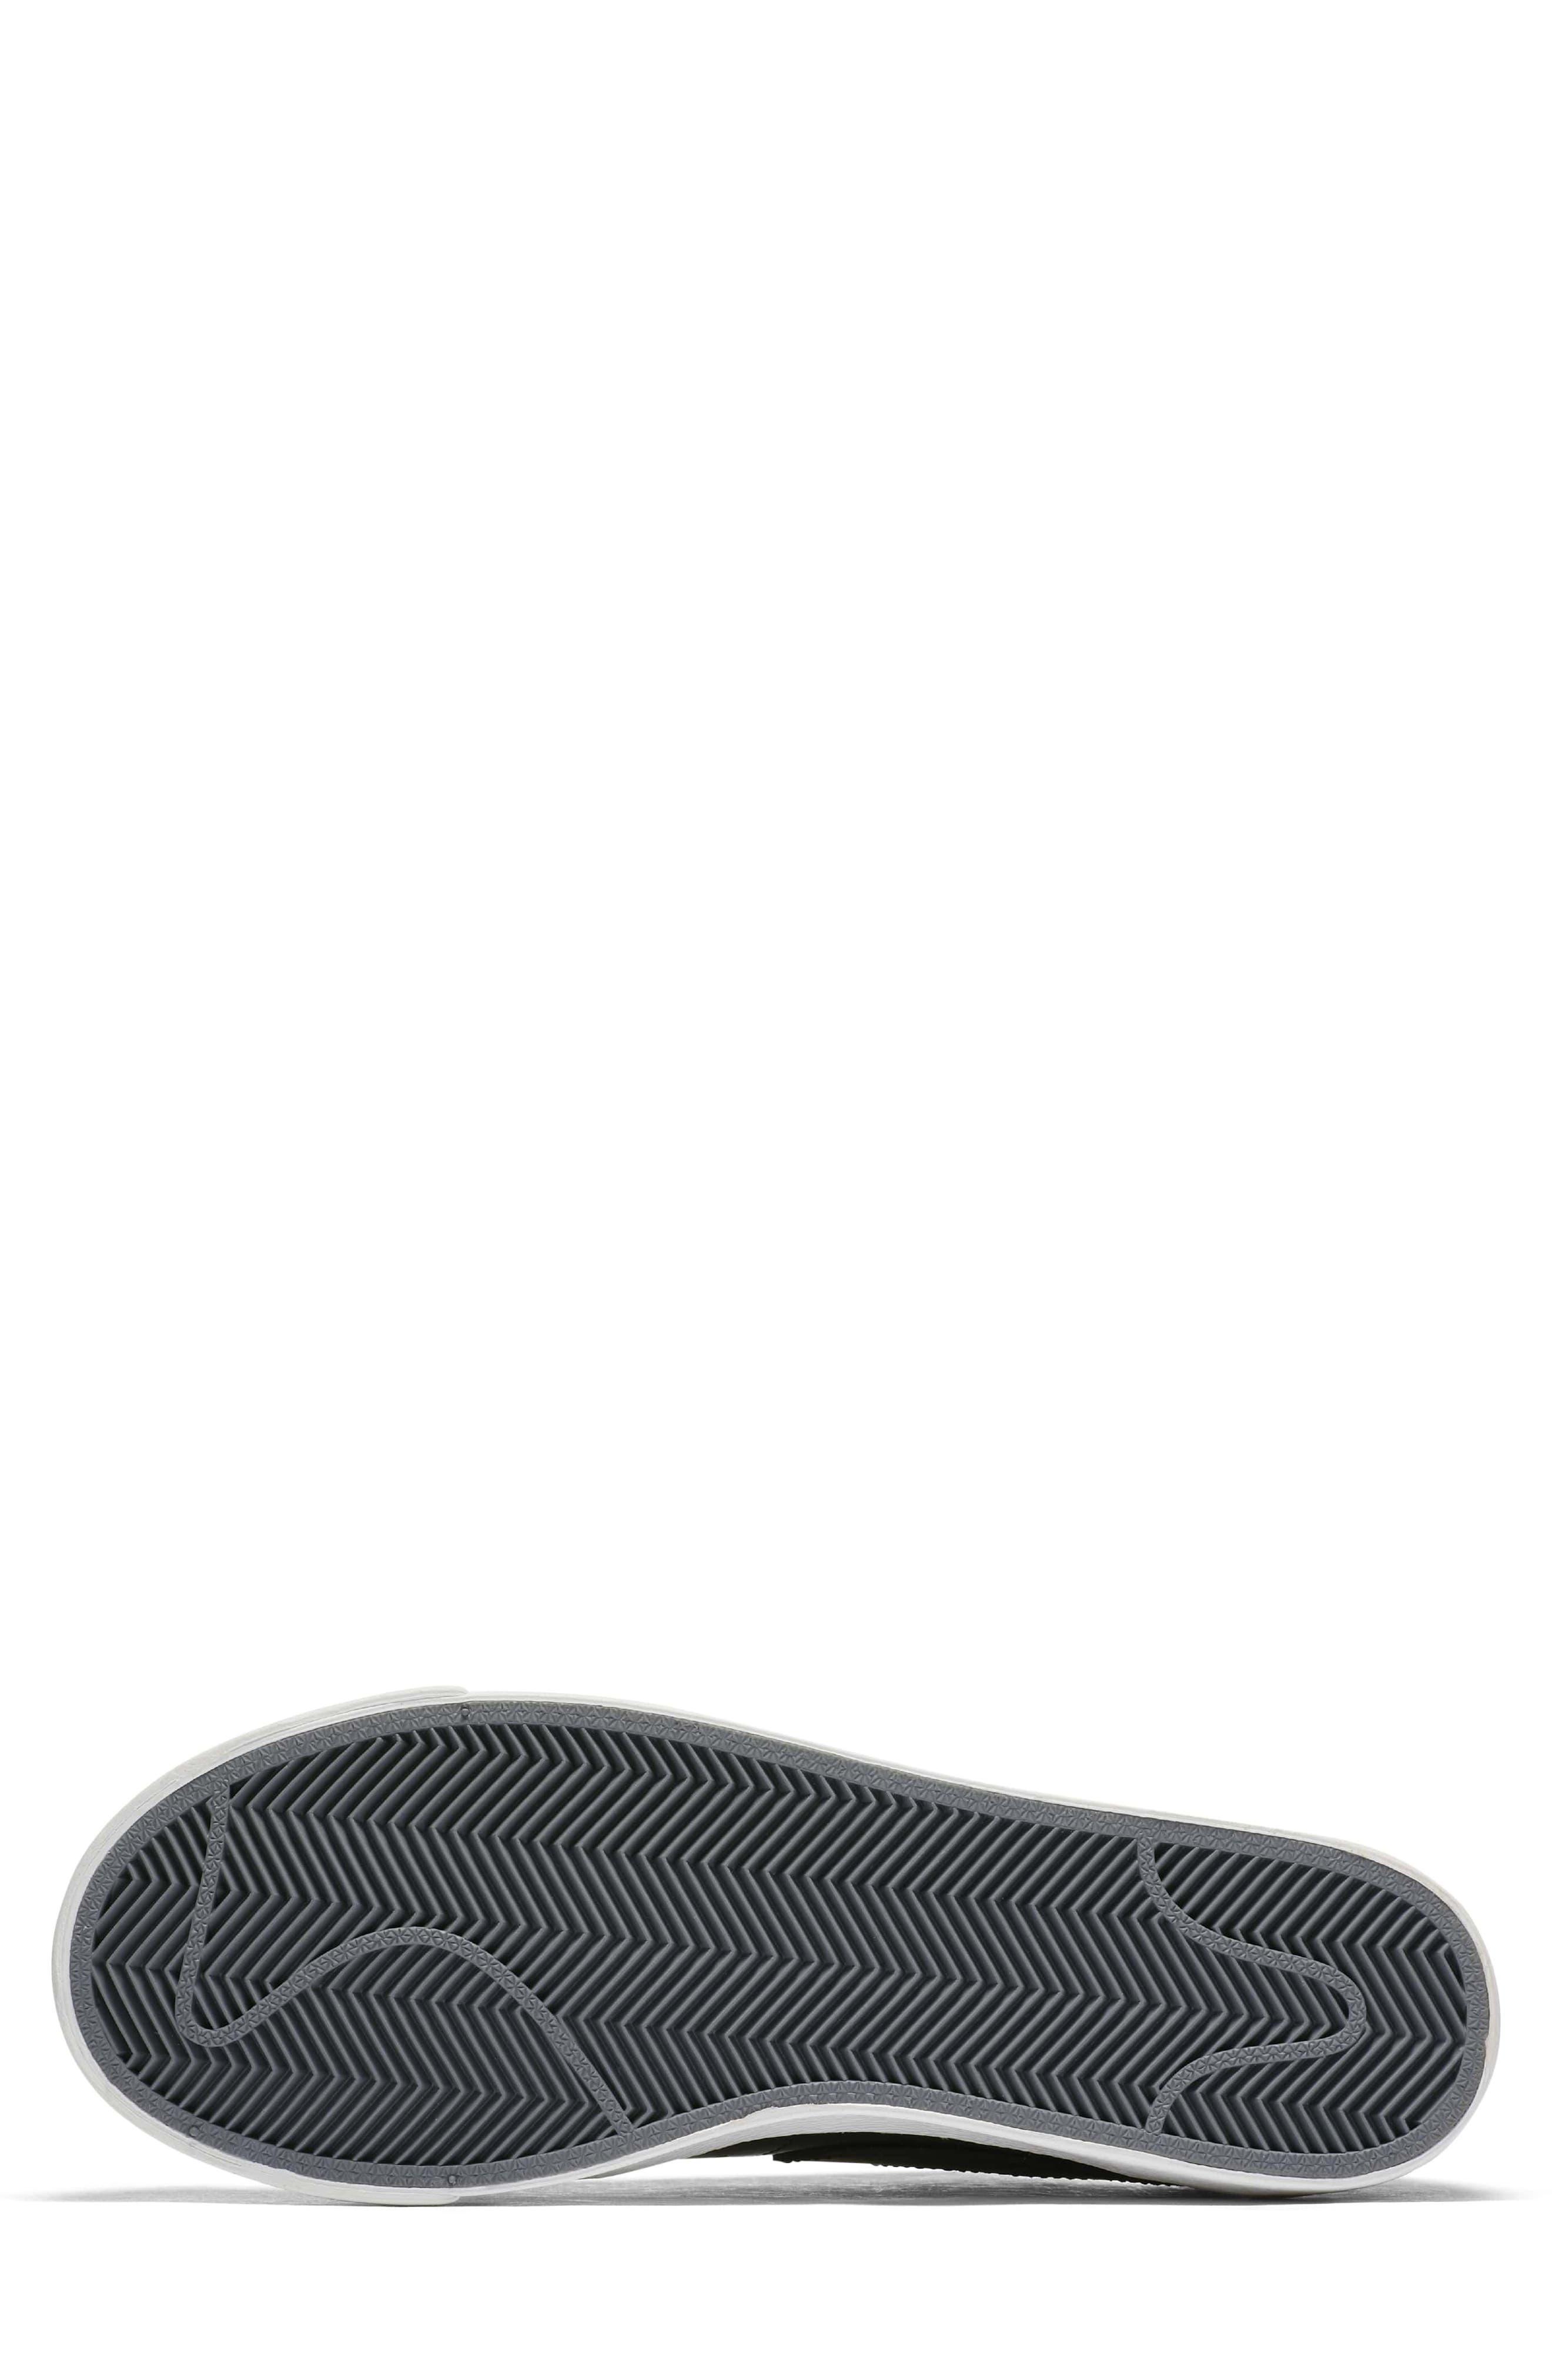 NIKE,                             Blazer Low Top Sneaker SE,                             Alternate thumbnail 5, color,                             001